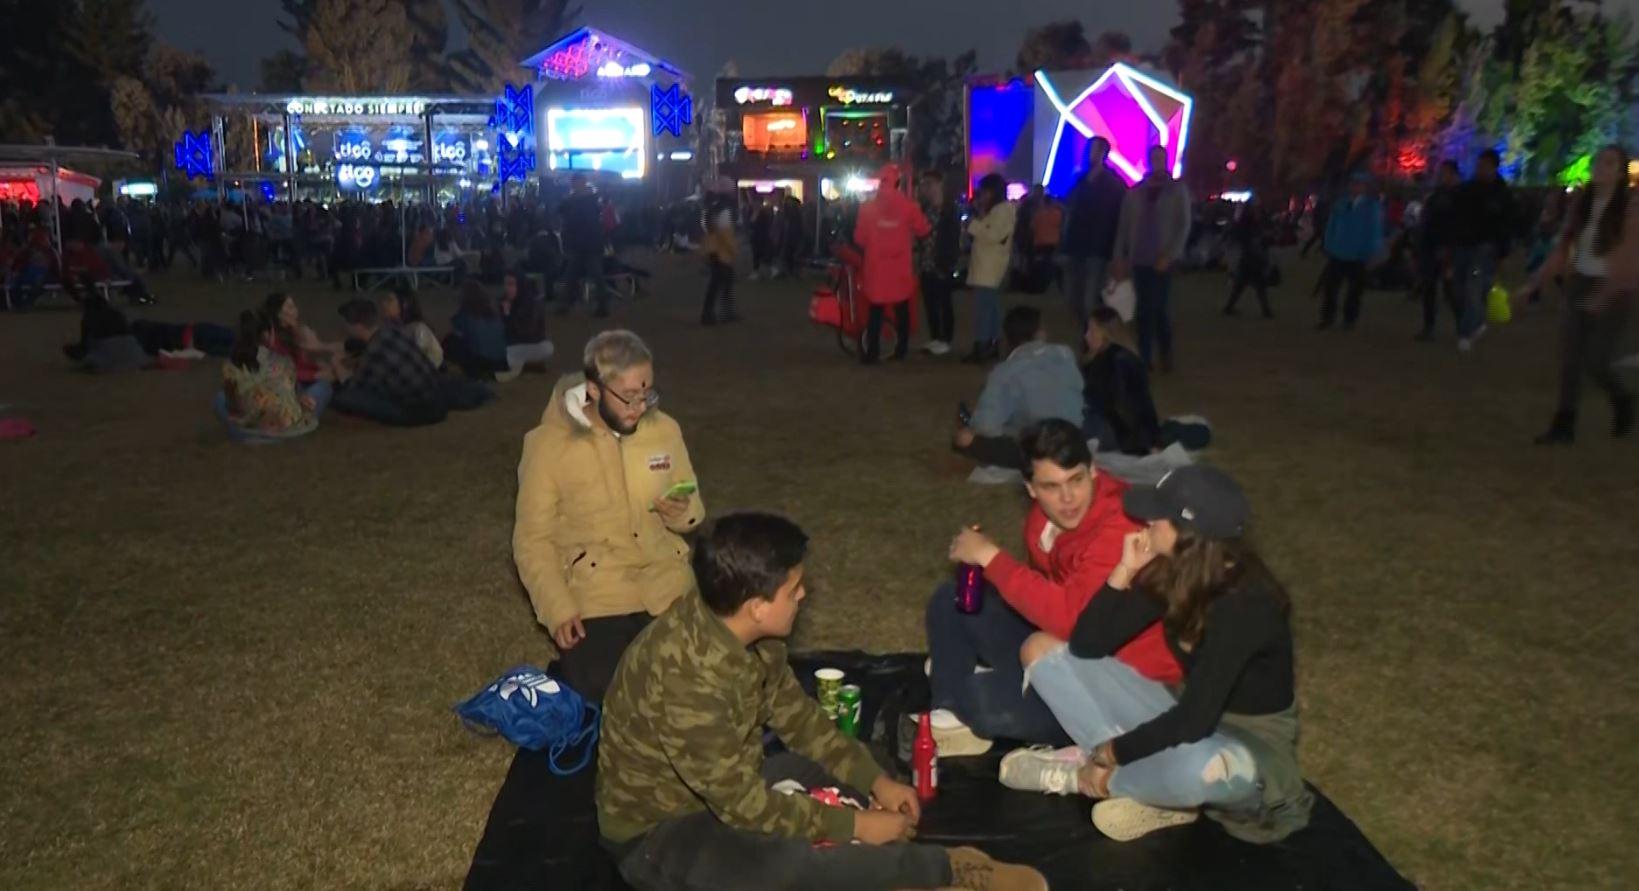 Grupo Niche, el grupo que le puso «salsa» al Festival Estéreo Picnic